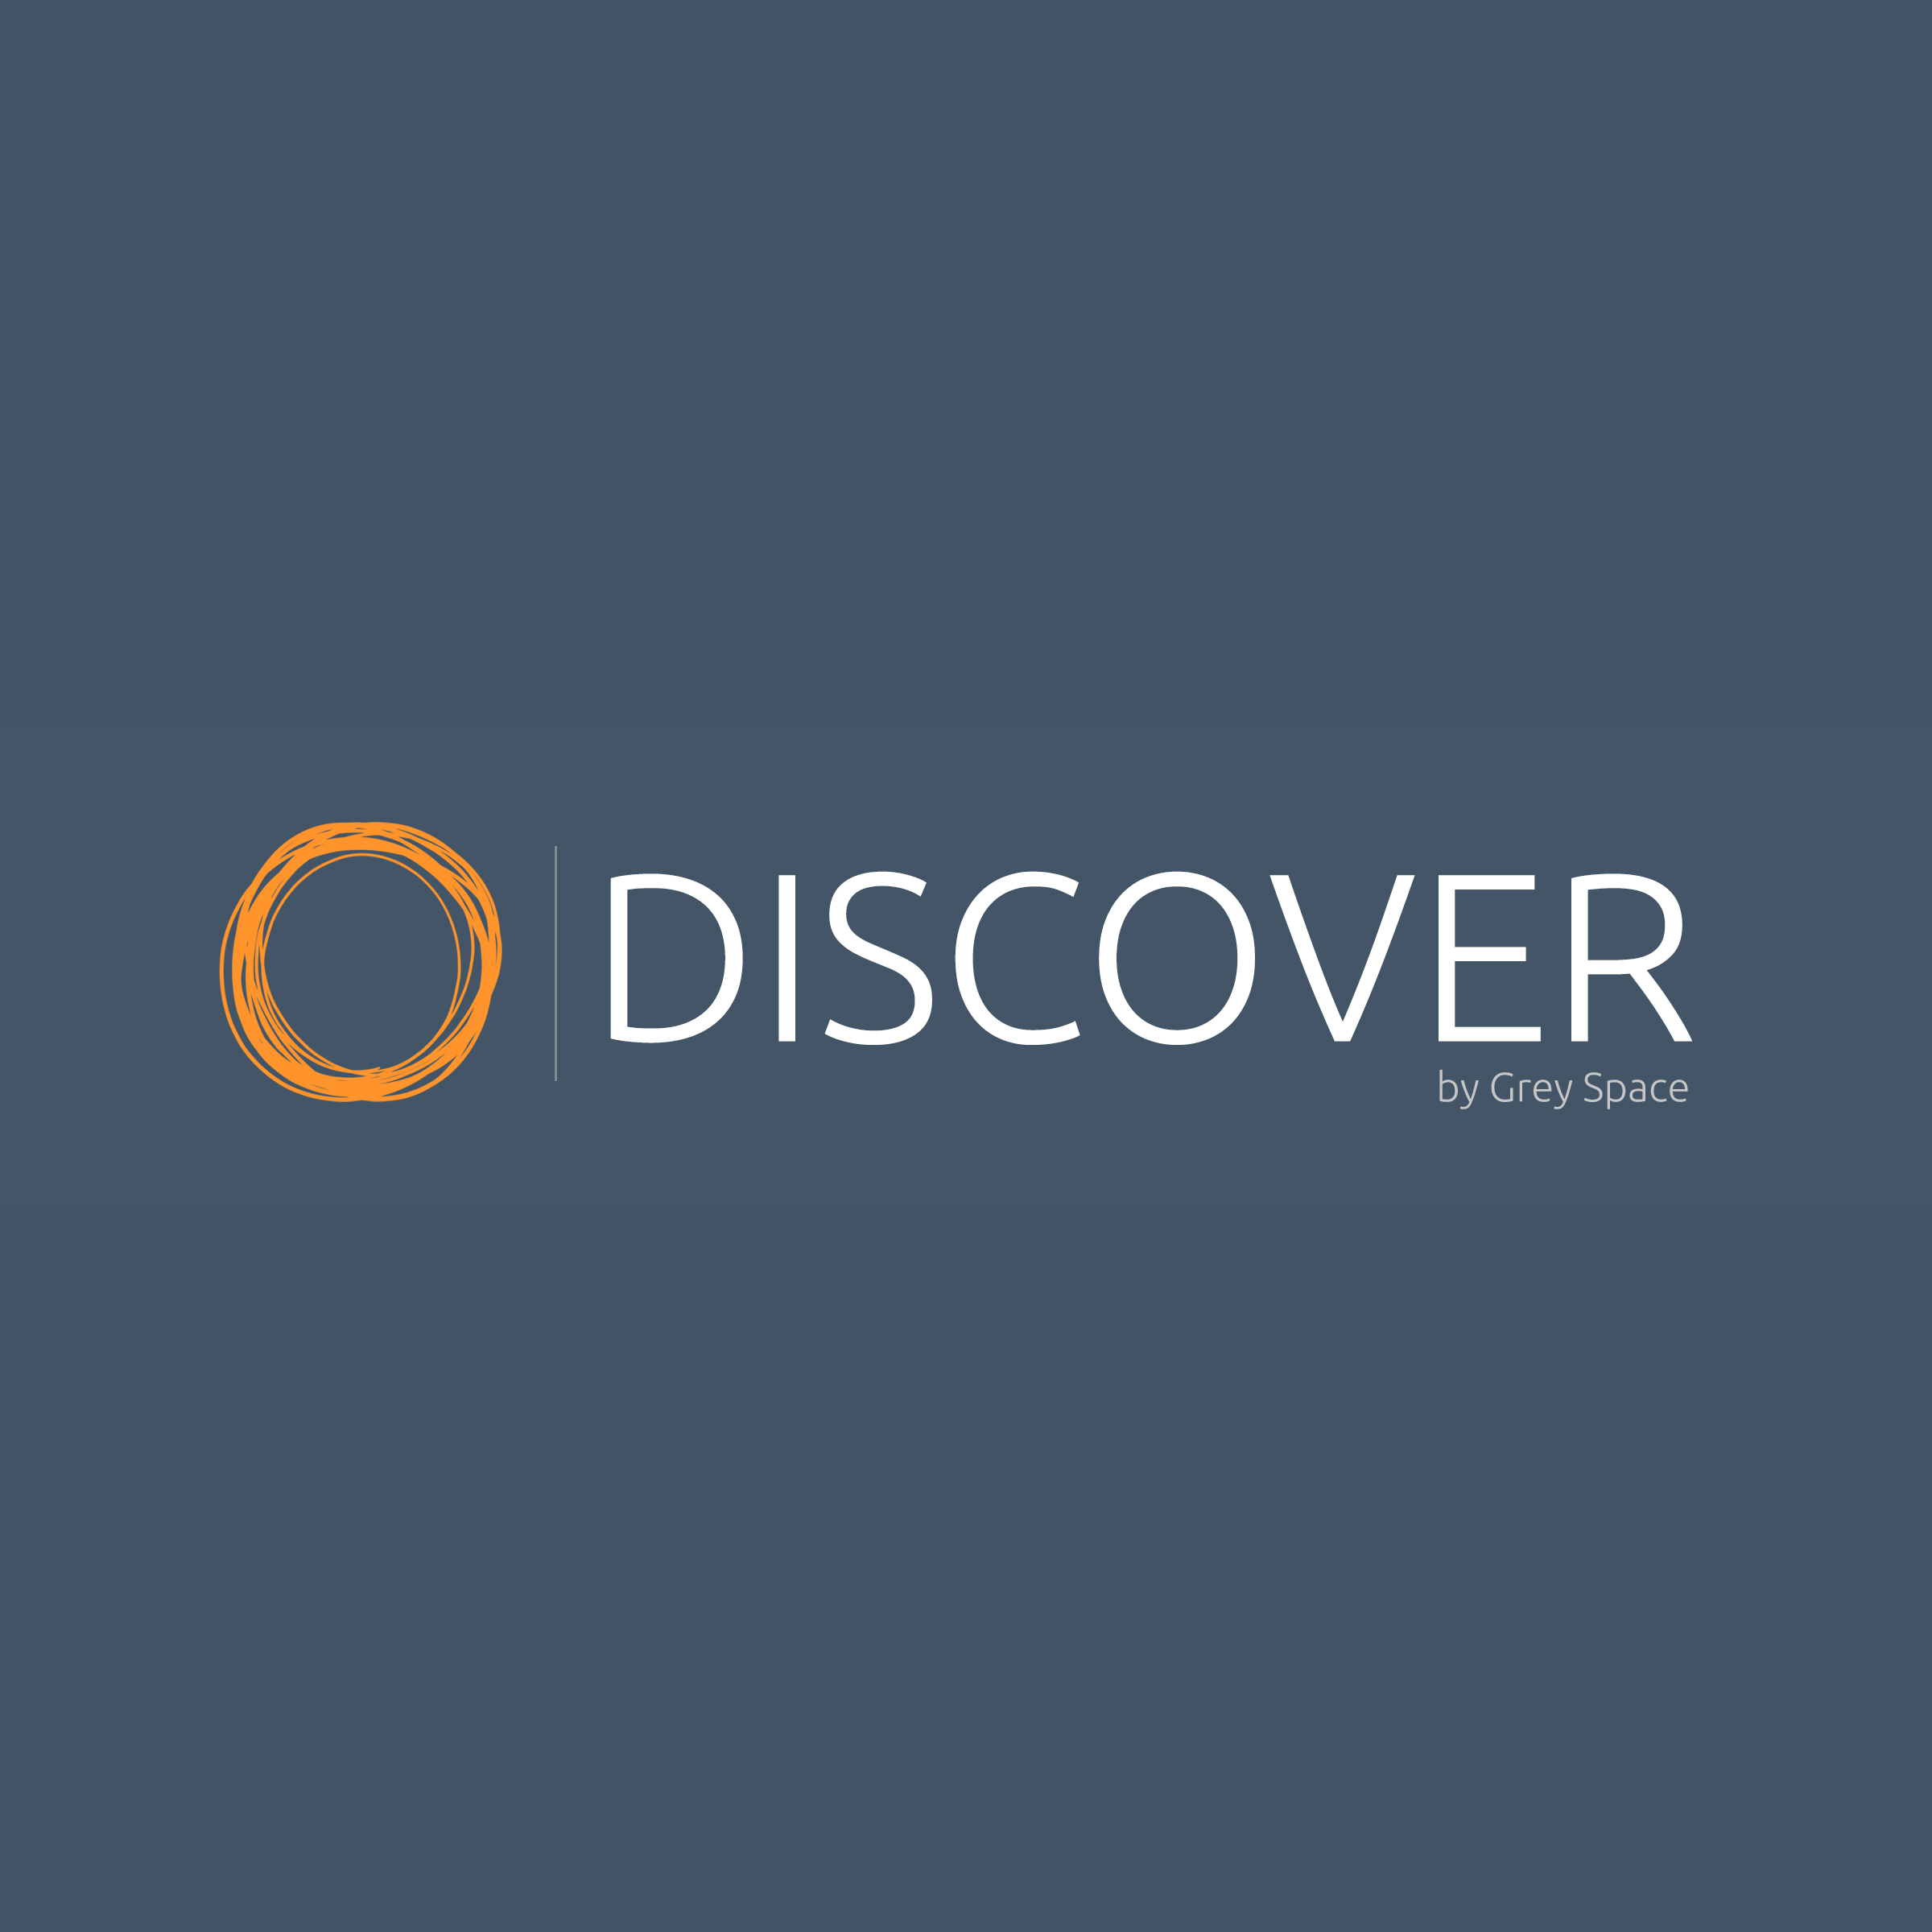 Blog_Discover Branding_Small_JPEG.jpg